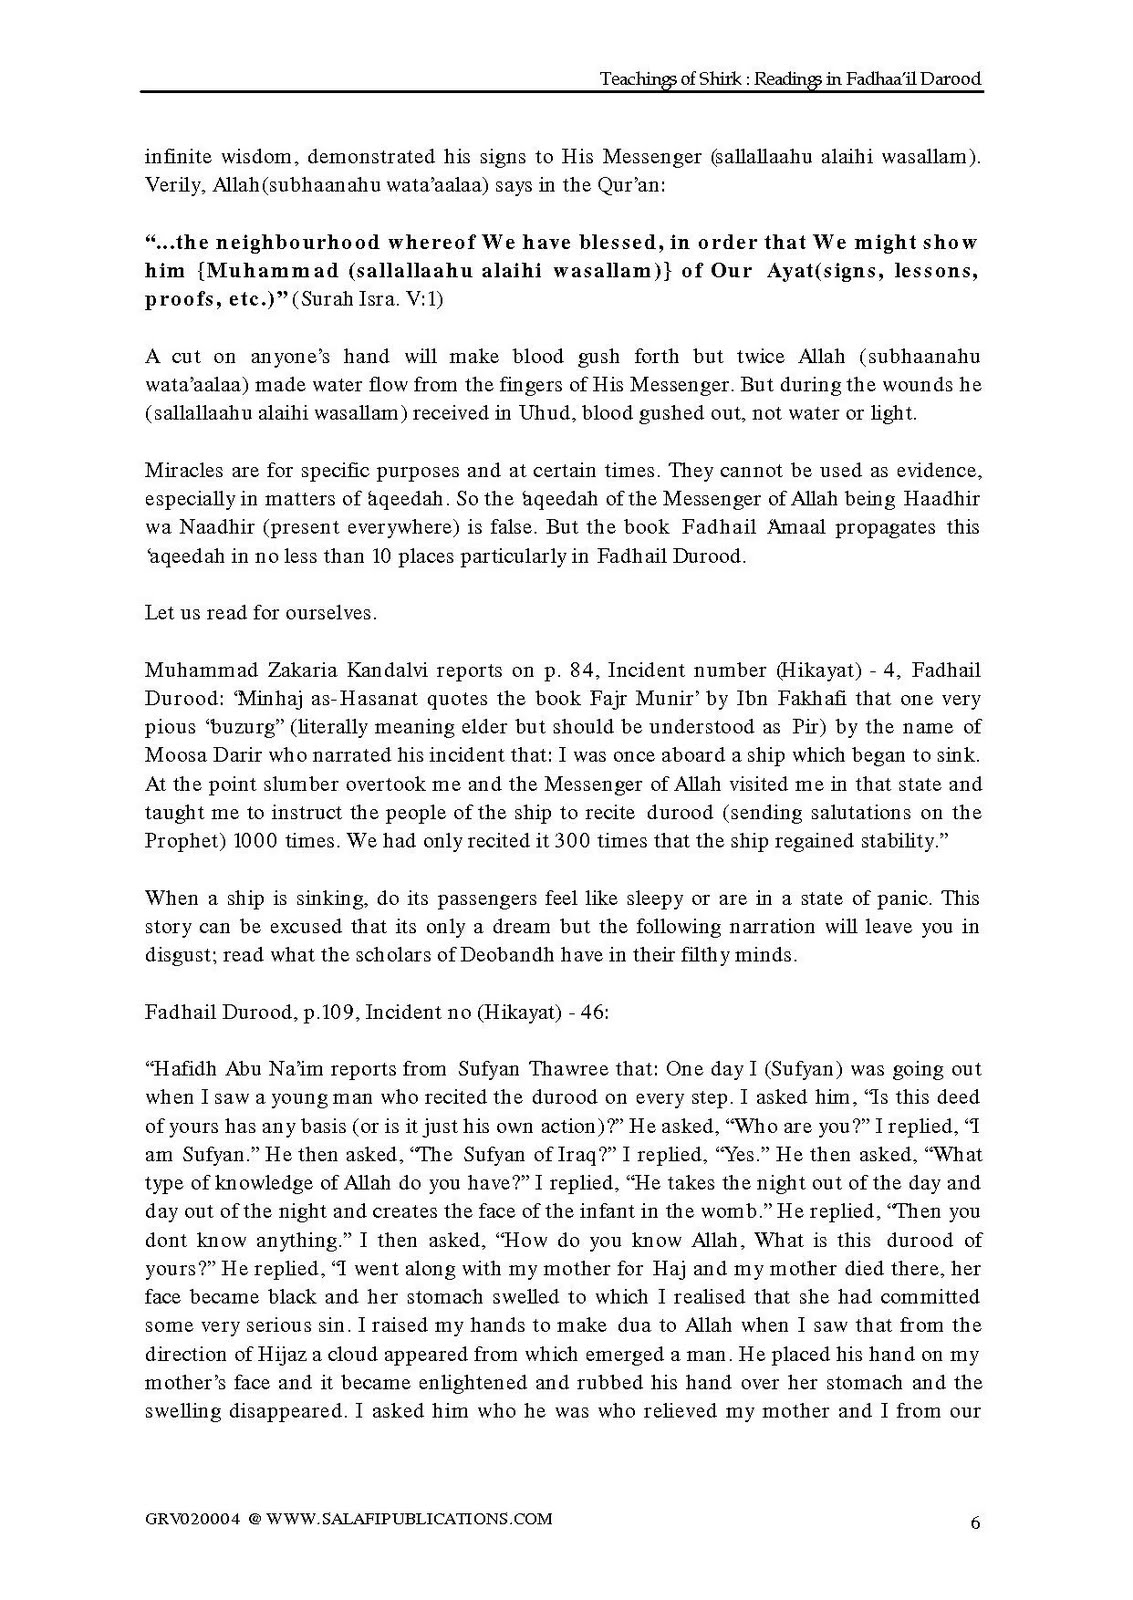 Chagatai Khan Saudi Fatwa Against Tableeghi Jamat But Jang Group Promotes Kufr Shirk Bida At